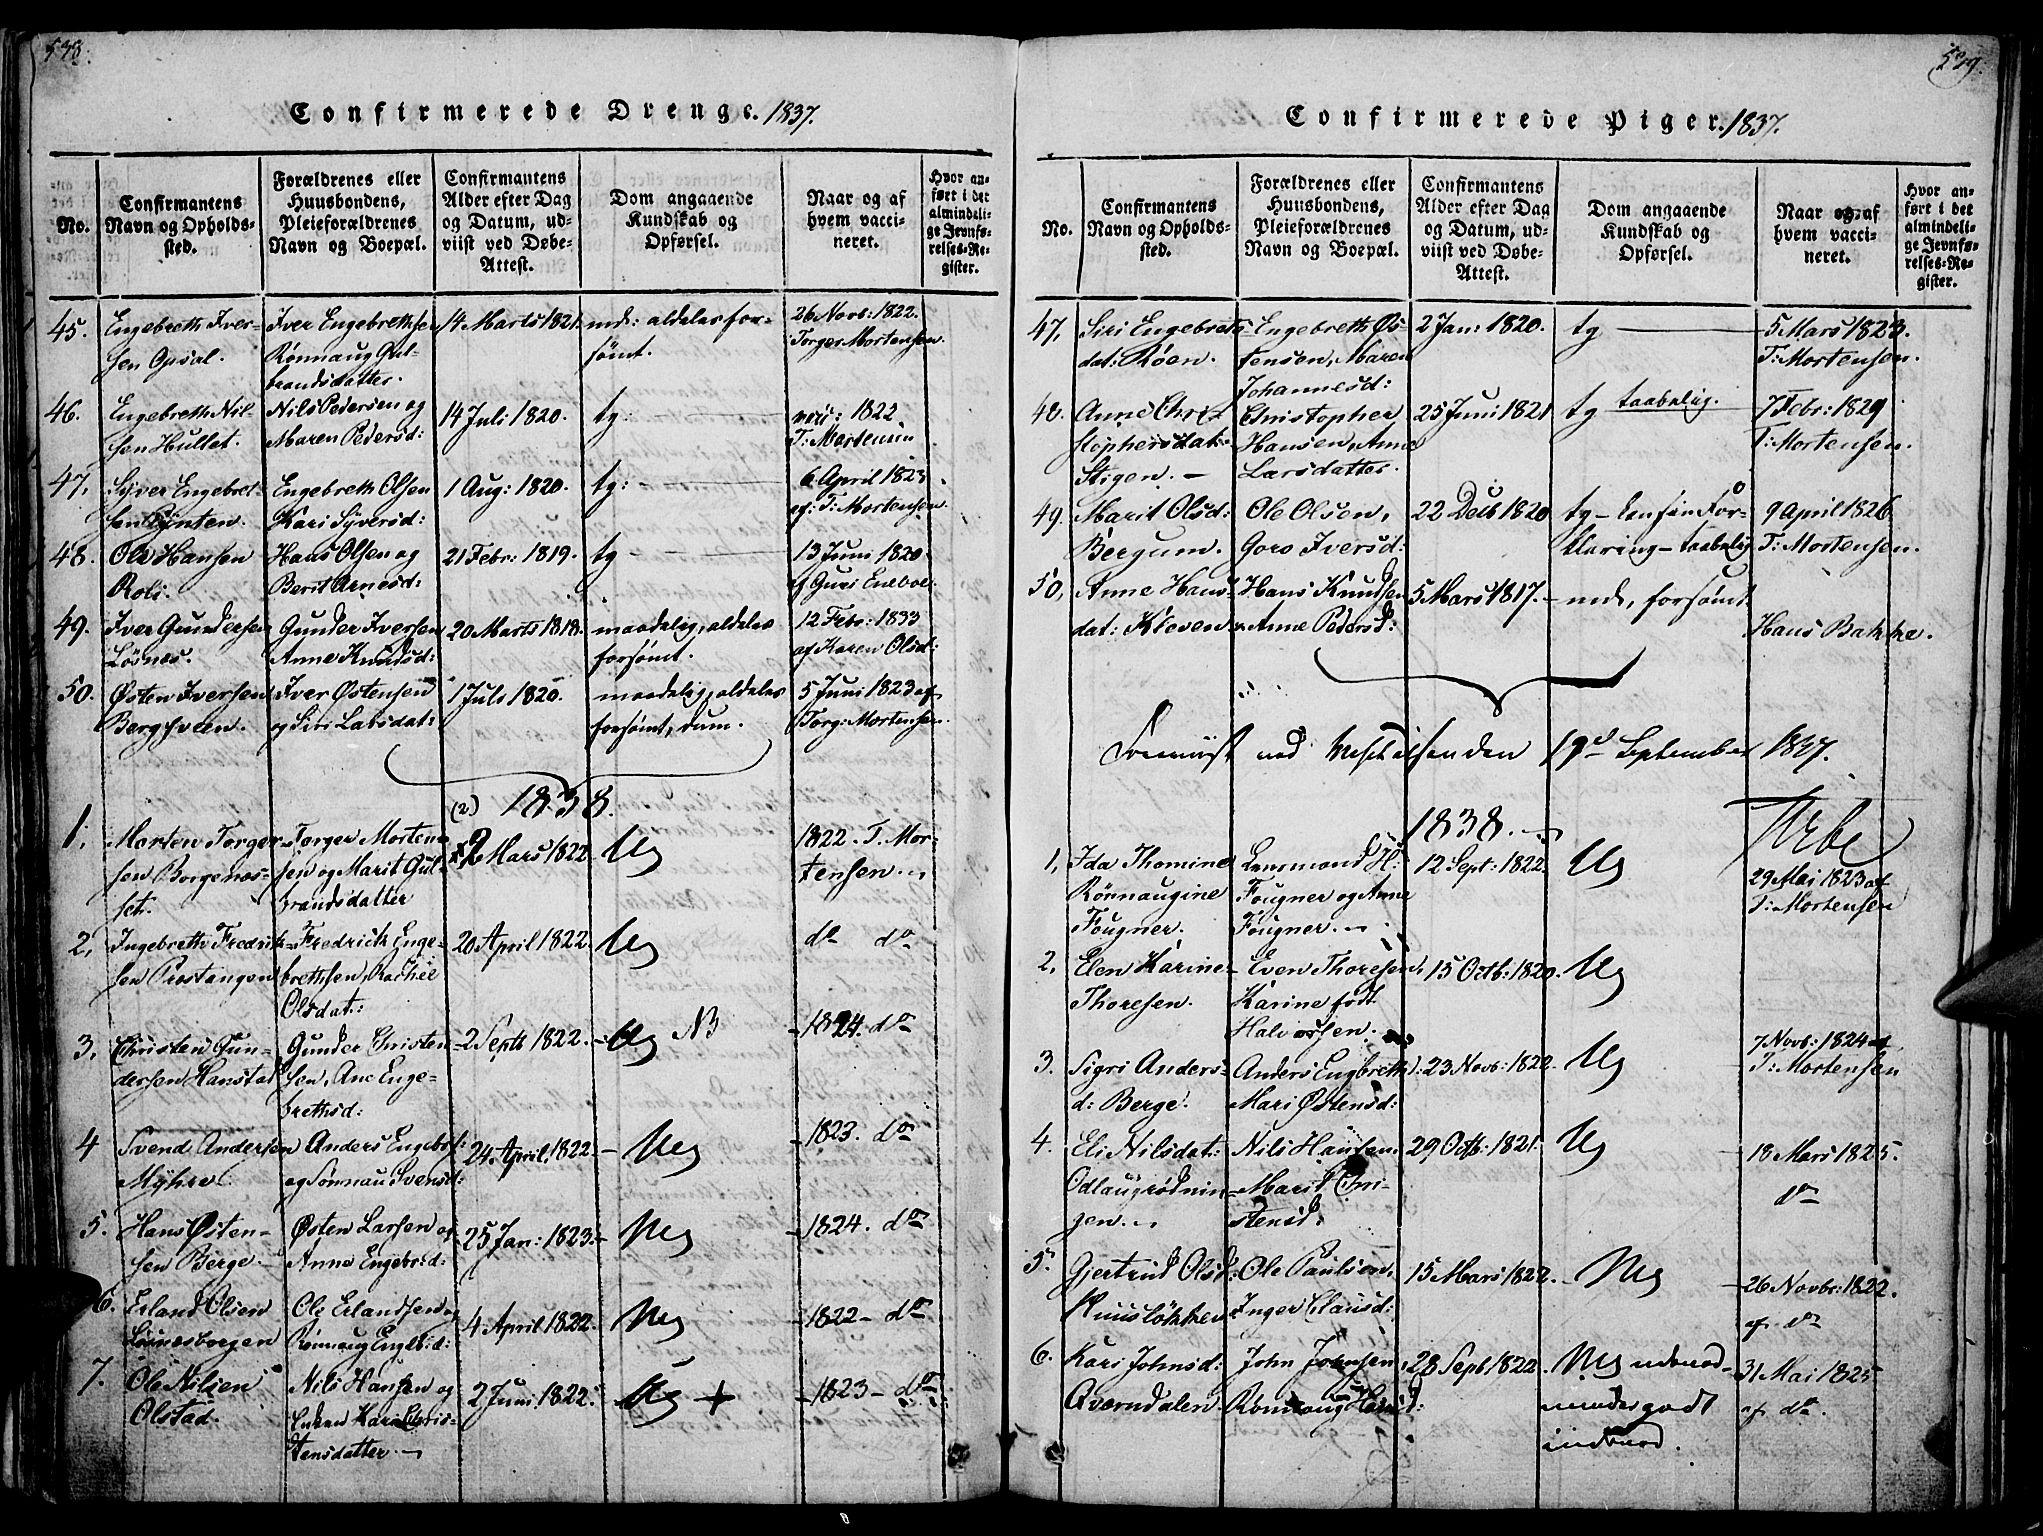 SAH, Ringebu prestekontor, Ministerialbok nr. 4, 1821-1839, s. 538-539